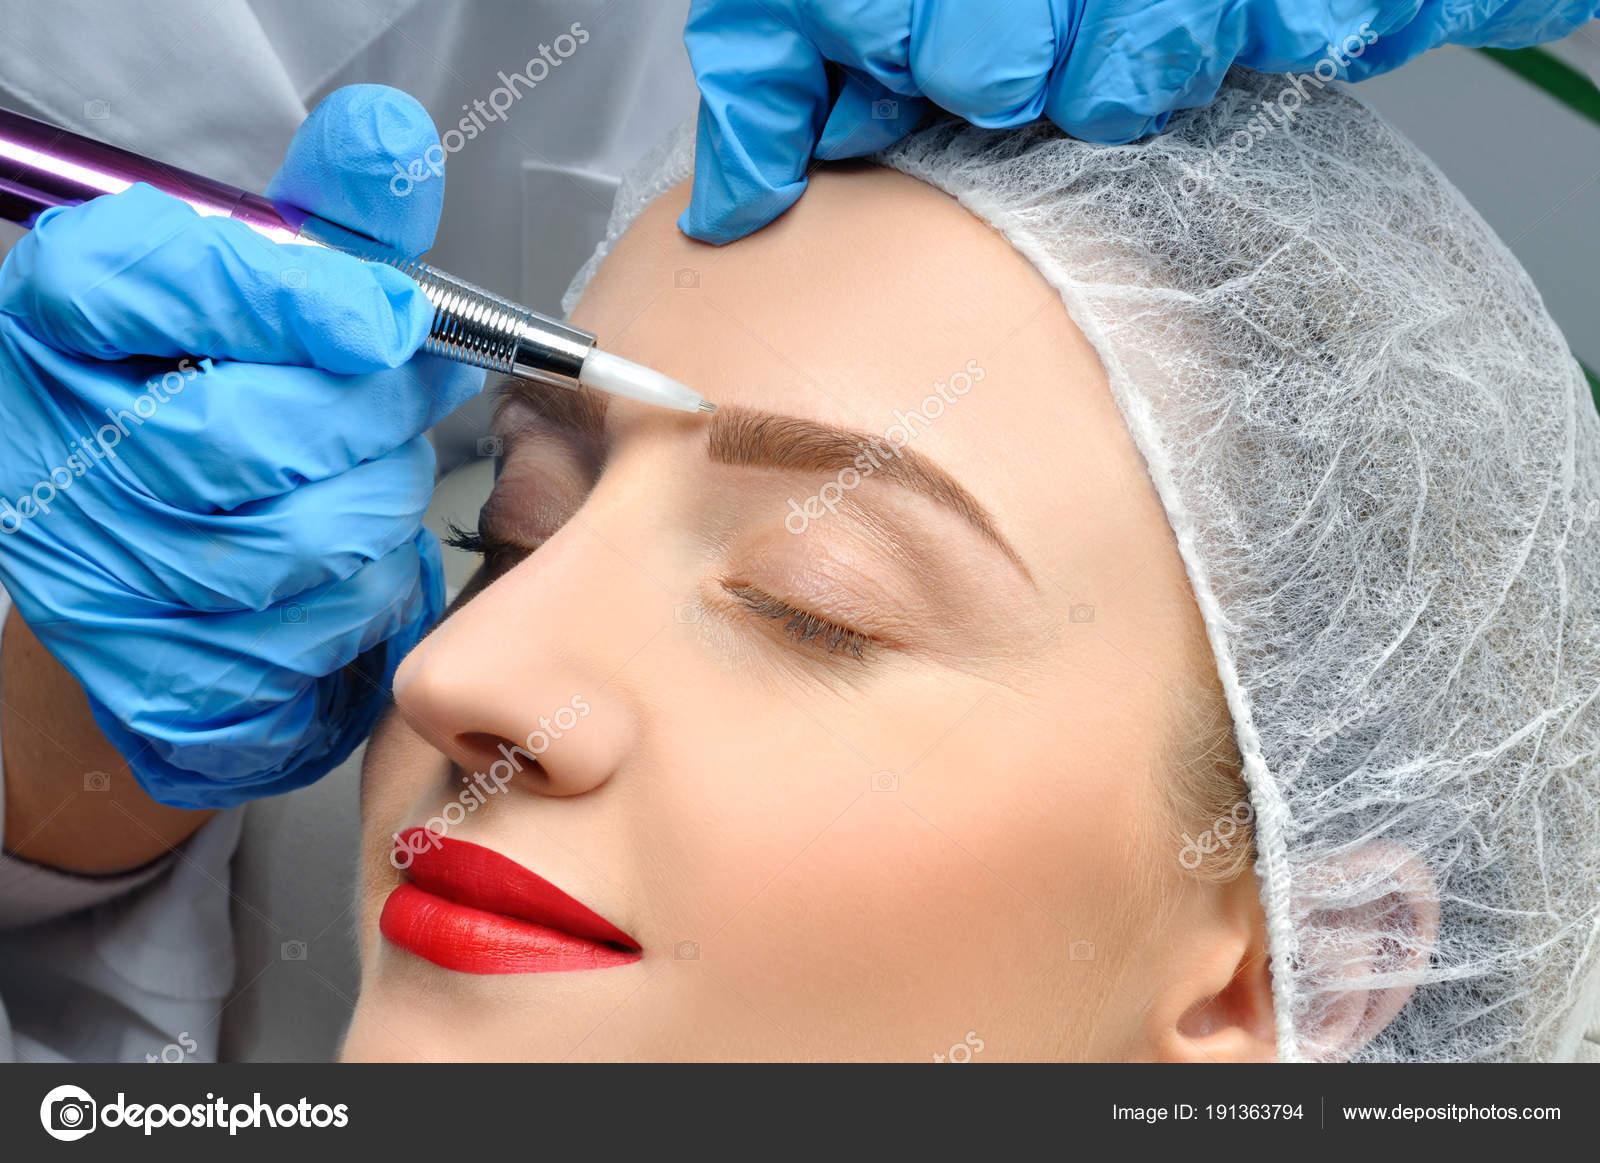 depositphotos_191363794-stock-photo-microblading-cosmetologist-making-permanent-makeup.jpg